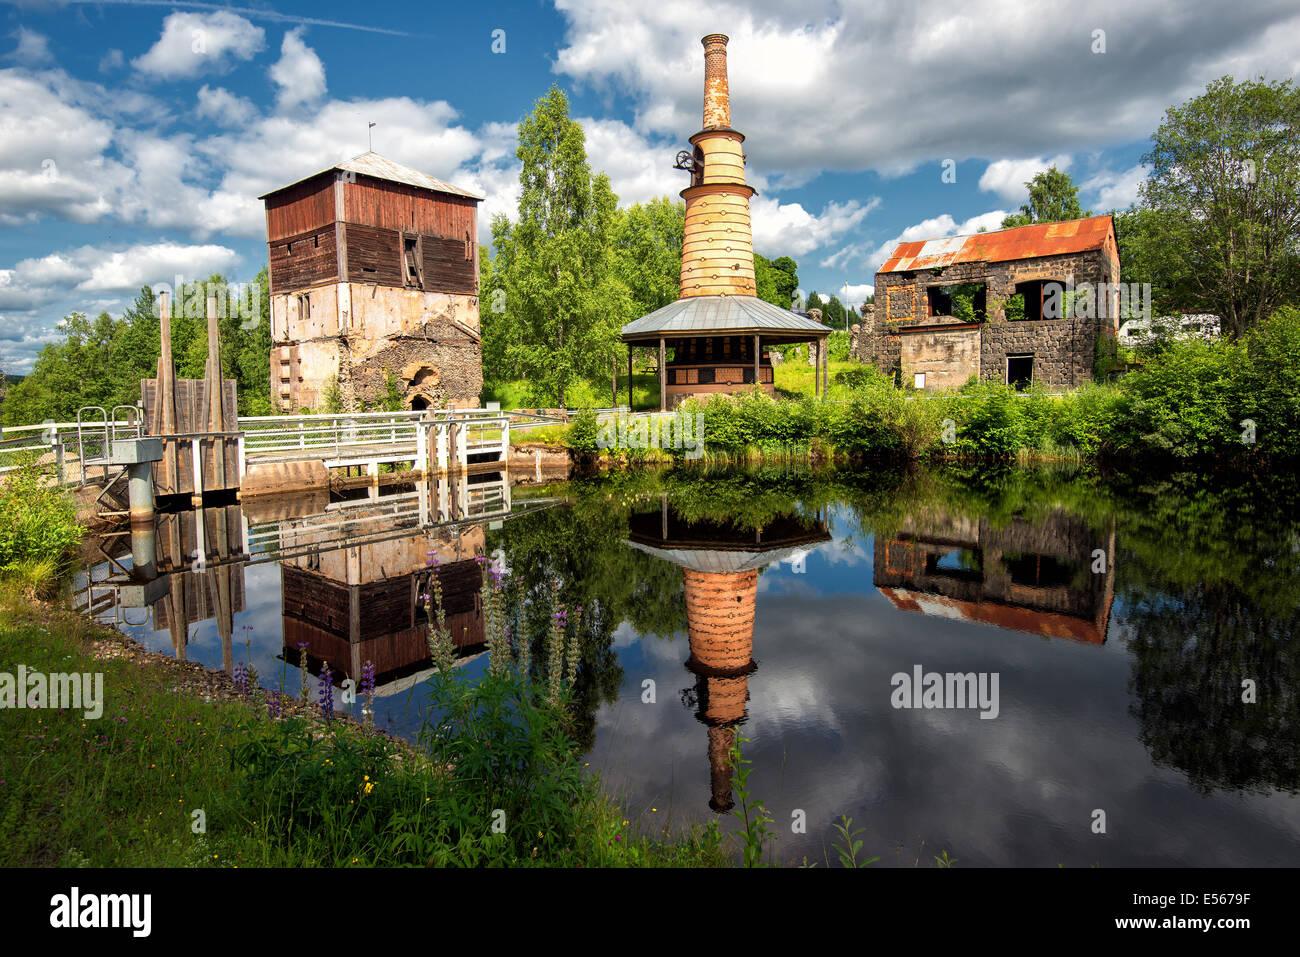 Abandoned historic ironworks in Ulvshyttan, Sweden - Stock Image